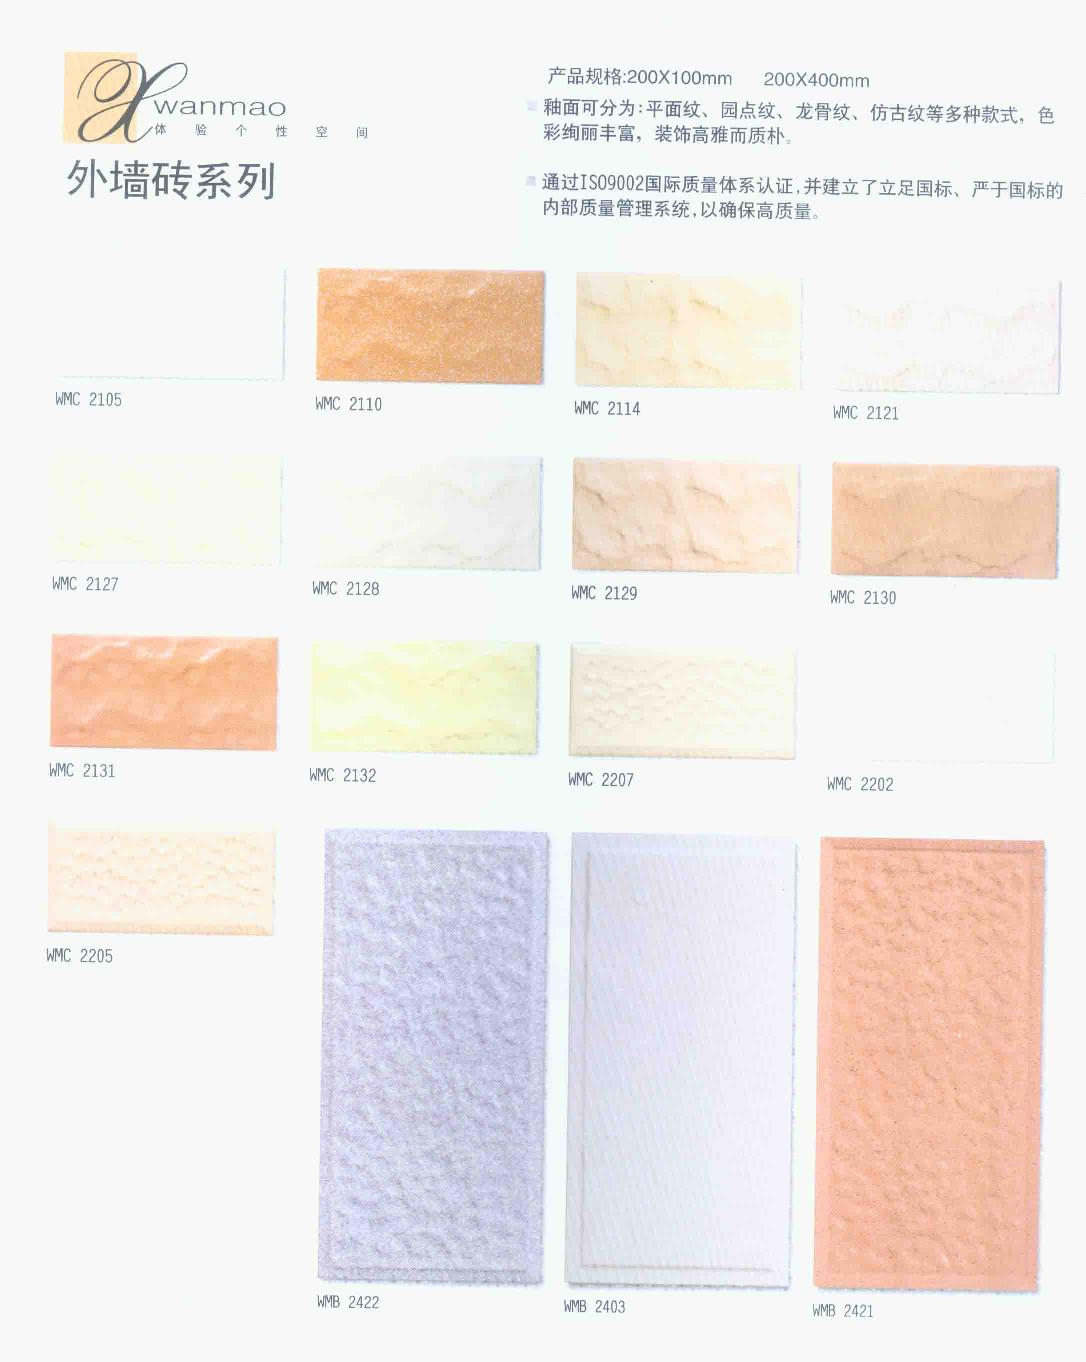 Outer Wall Tile (Наружную стену плиткой)